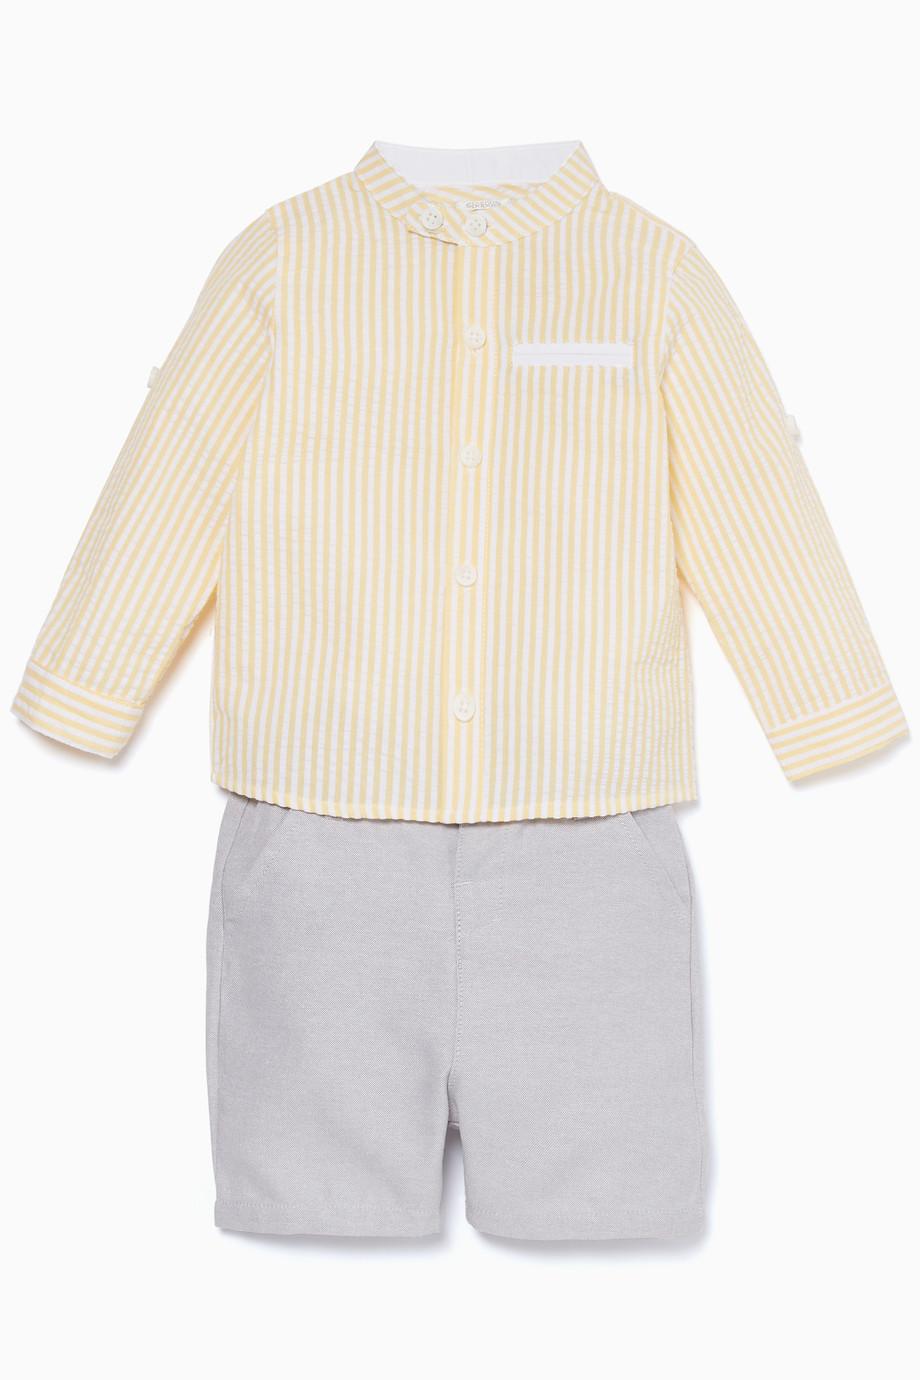 7895291092918a Shop Mamas & Papas Yellow Seersucker Shirt & Shorts Set for Kids ...